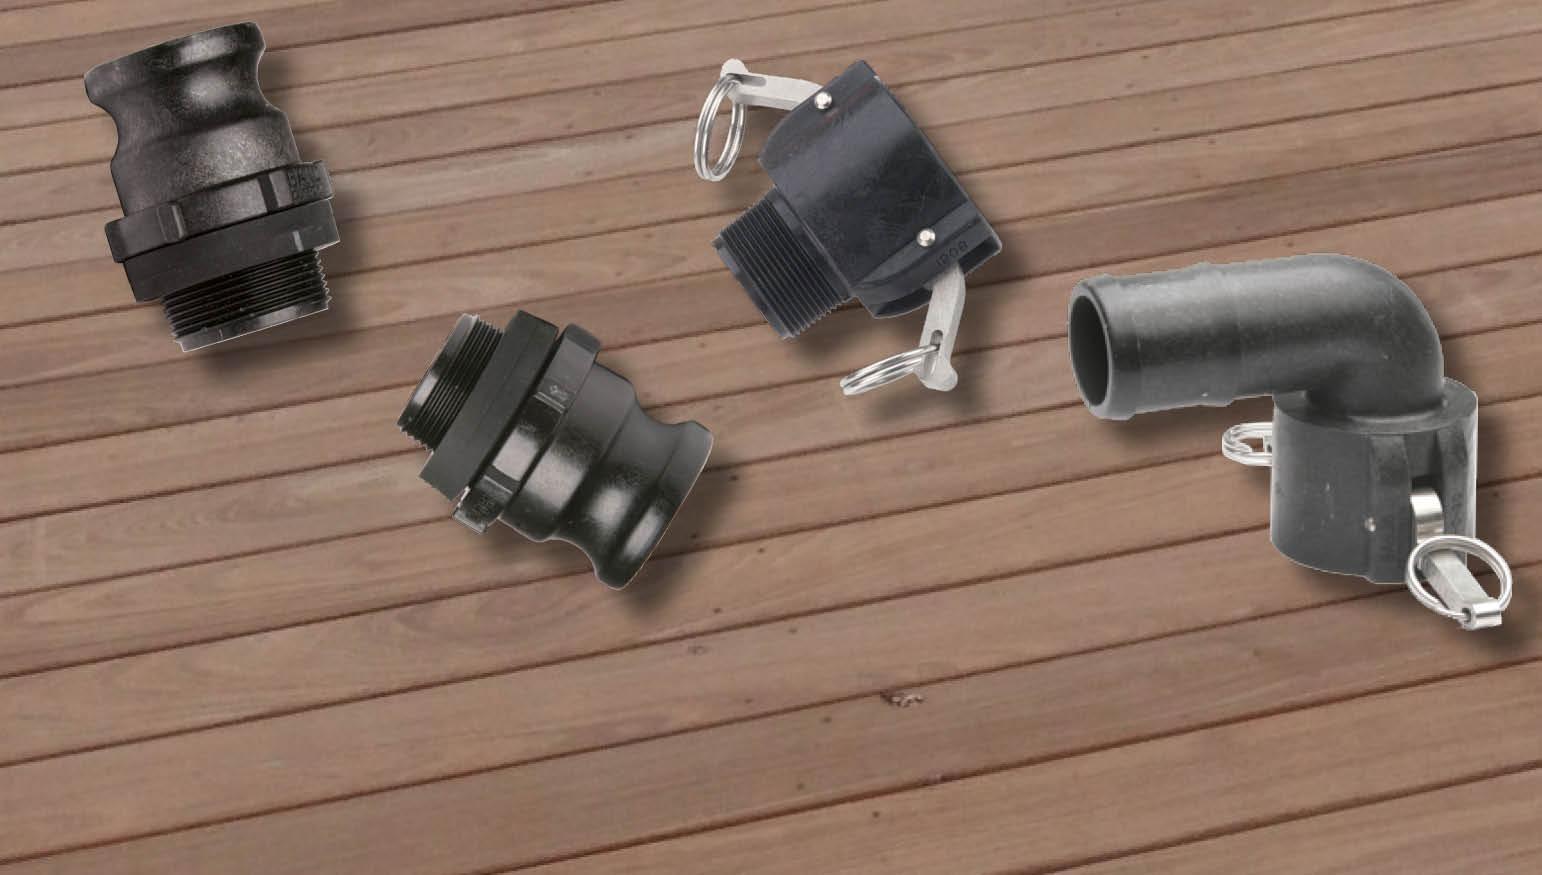 top-banner-acc-fittings-hosesfittingsacc-qc-adapters-hose-couplings-lg-.jpg